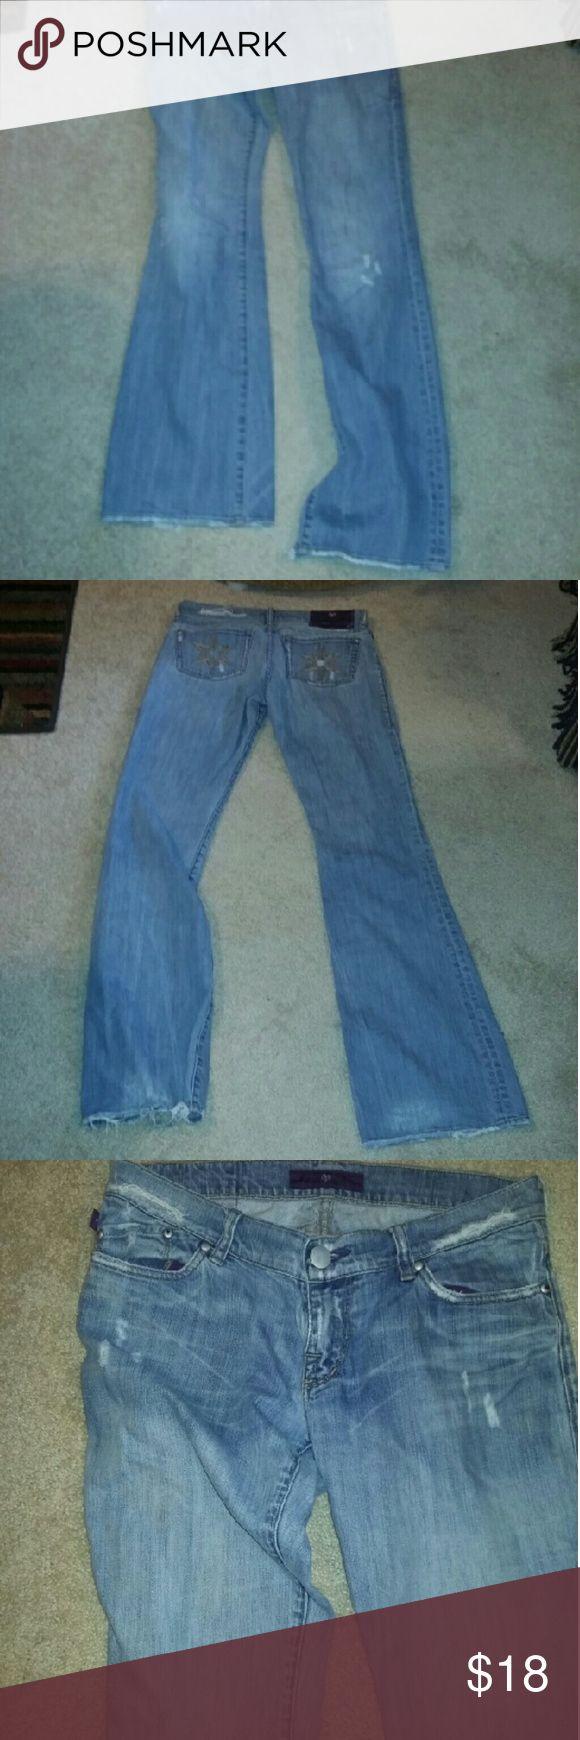 Spotted while shopping on Poshmark: Victiria Beckham Star distressed women jeans! #poshmark #fashion #shopping #style #Victoria Beckham #Denim